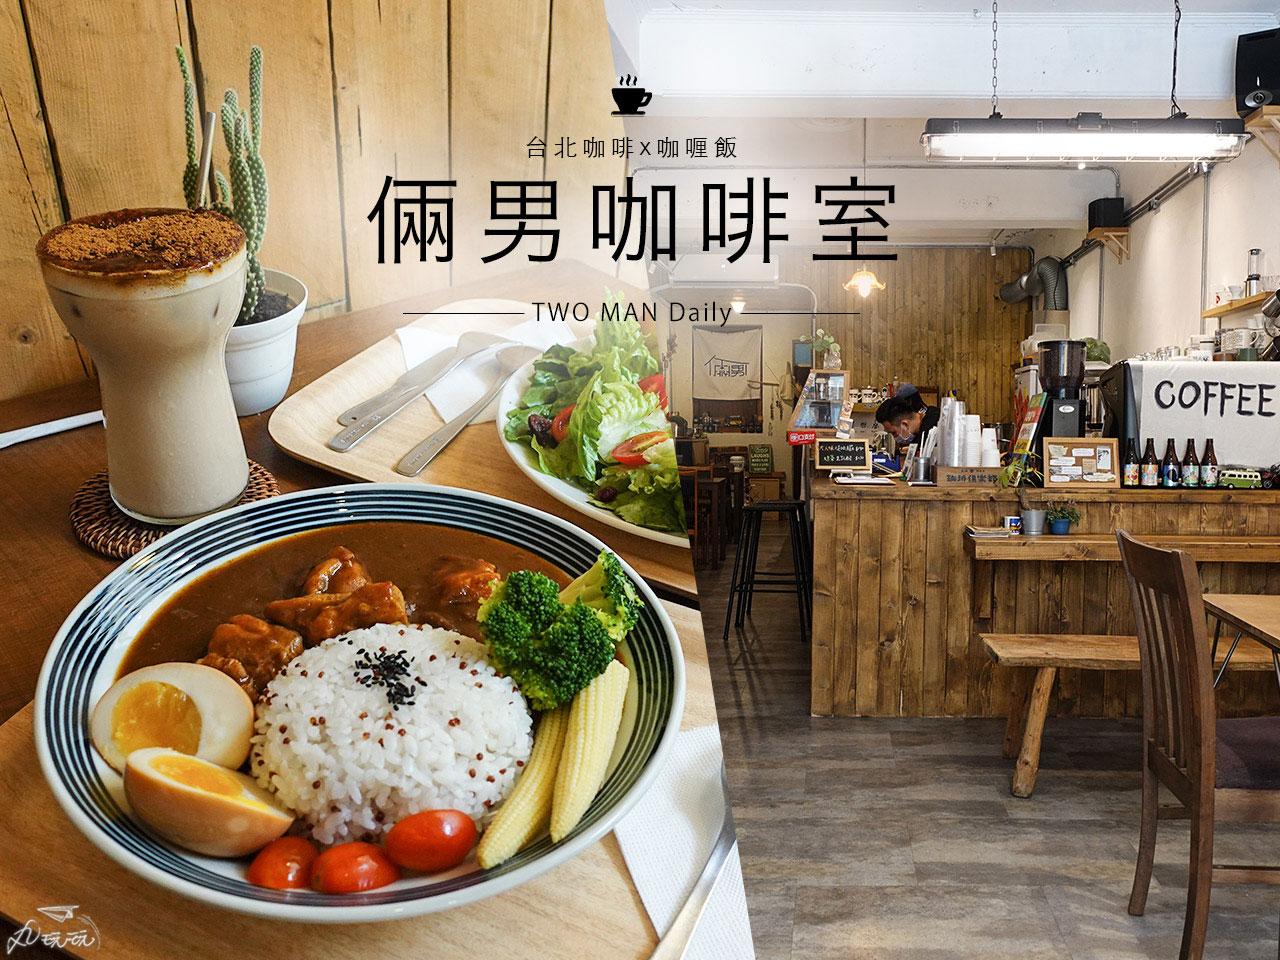 You are currently viewing 台北咖啡|倆男咖啡室 不只咖喱飯超美味,連咖啡奶茶布丁吐司都好厲害